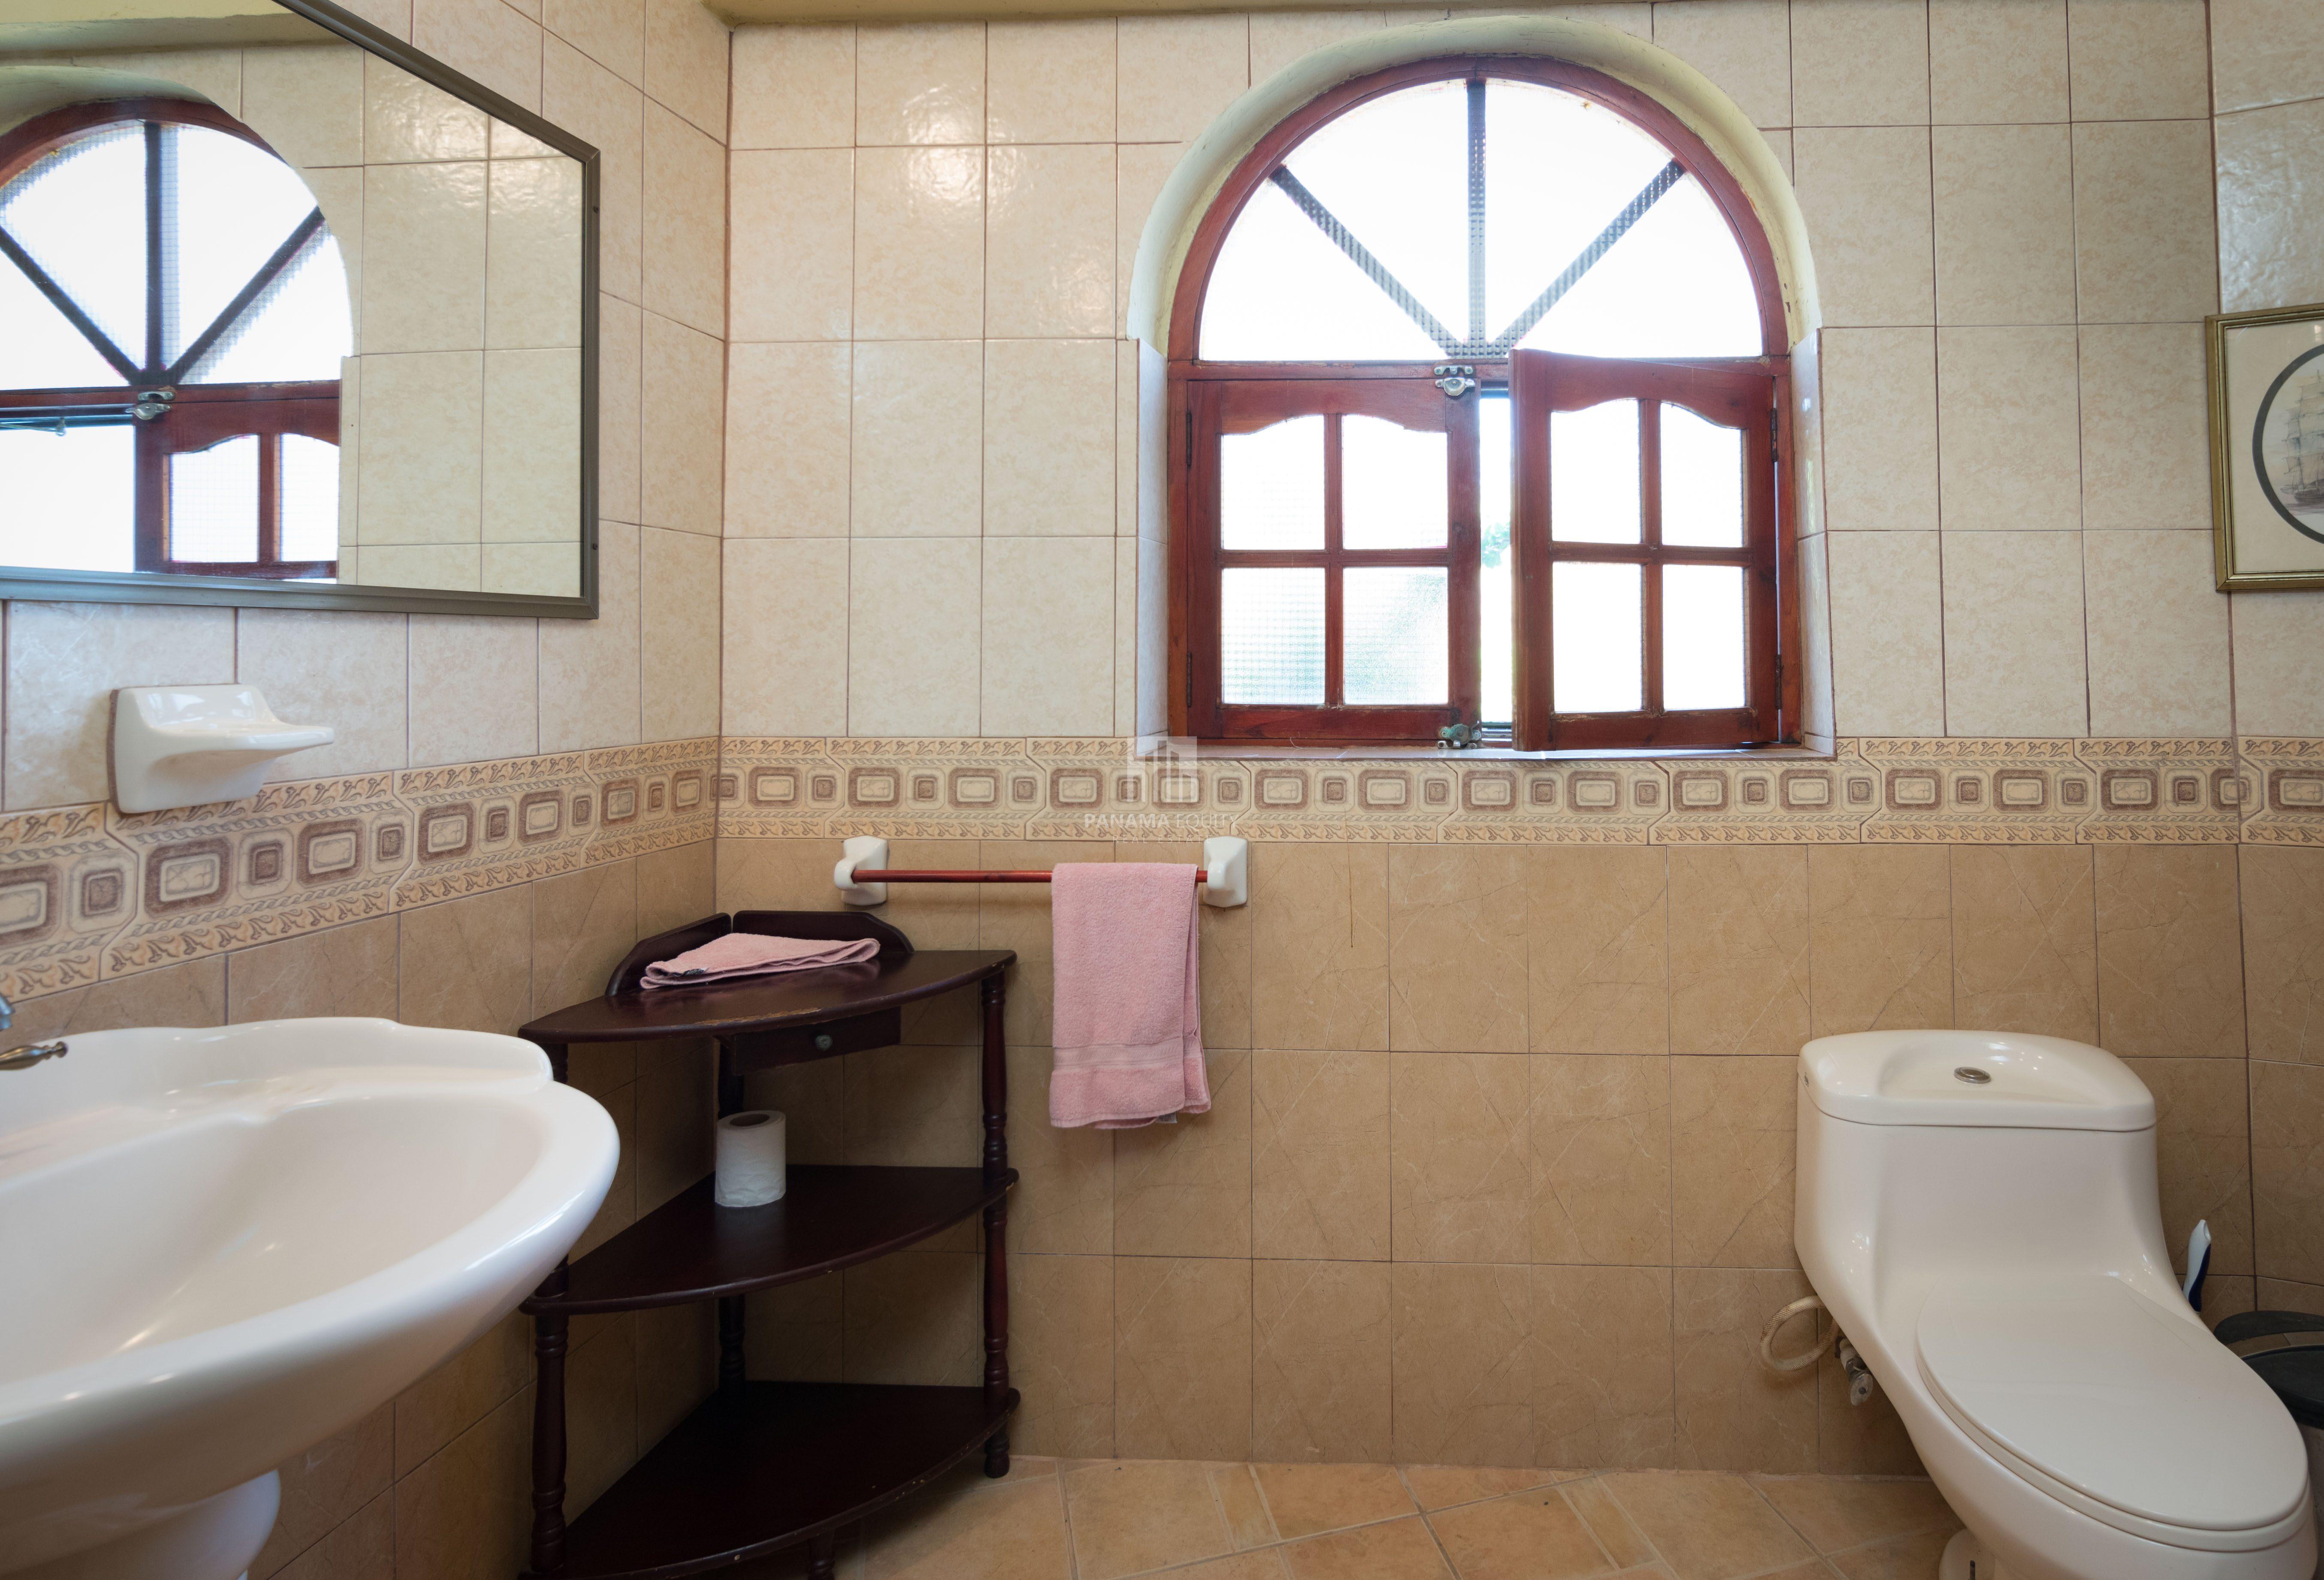 Villa Malibu, Playa Venao - Panama Equity